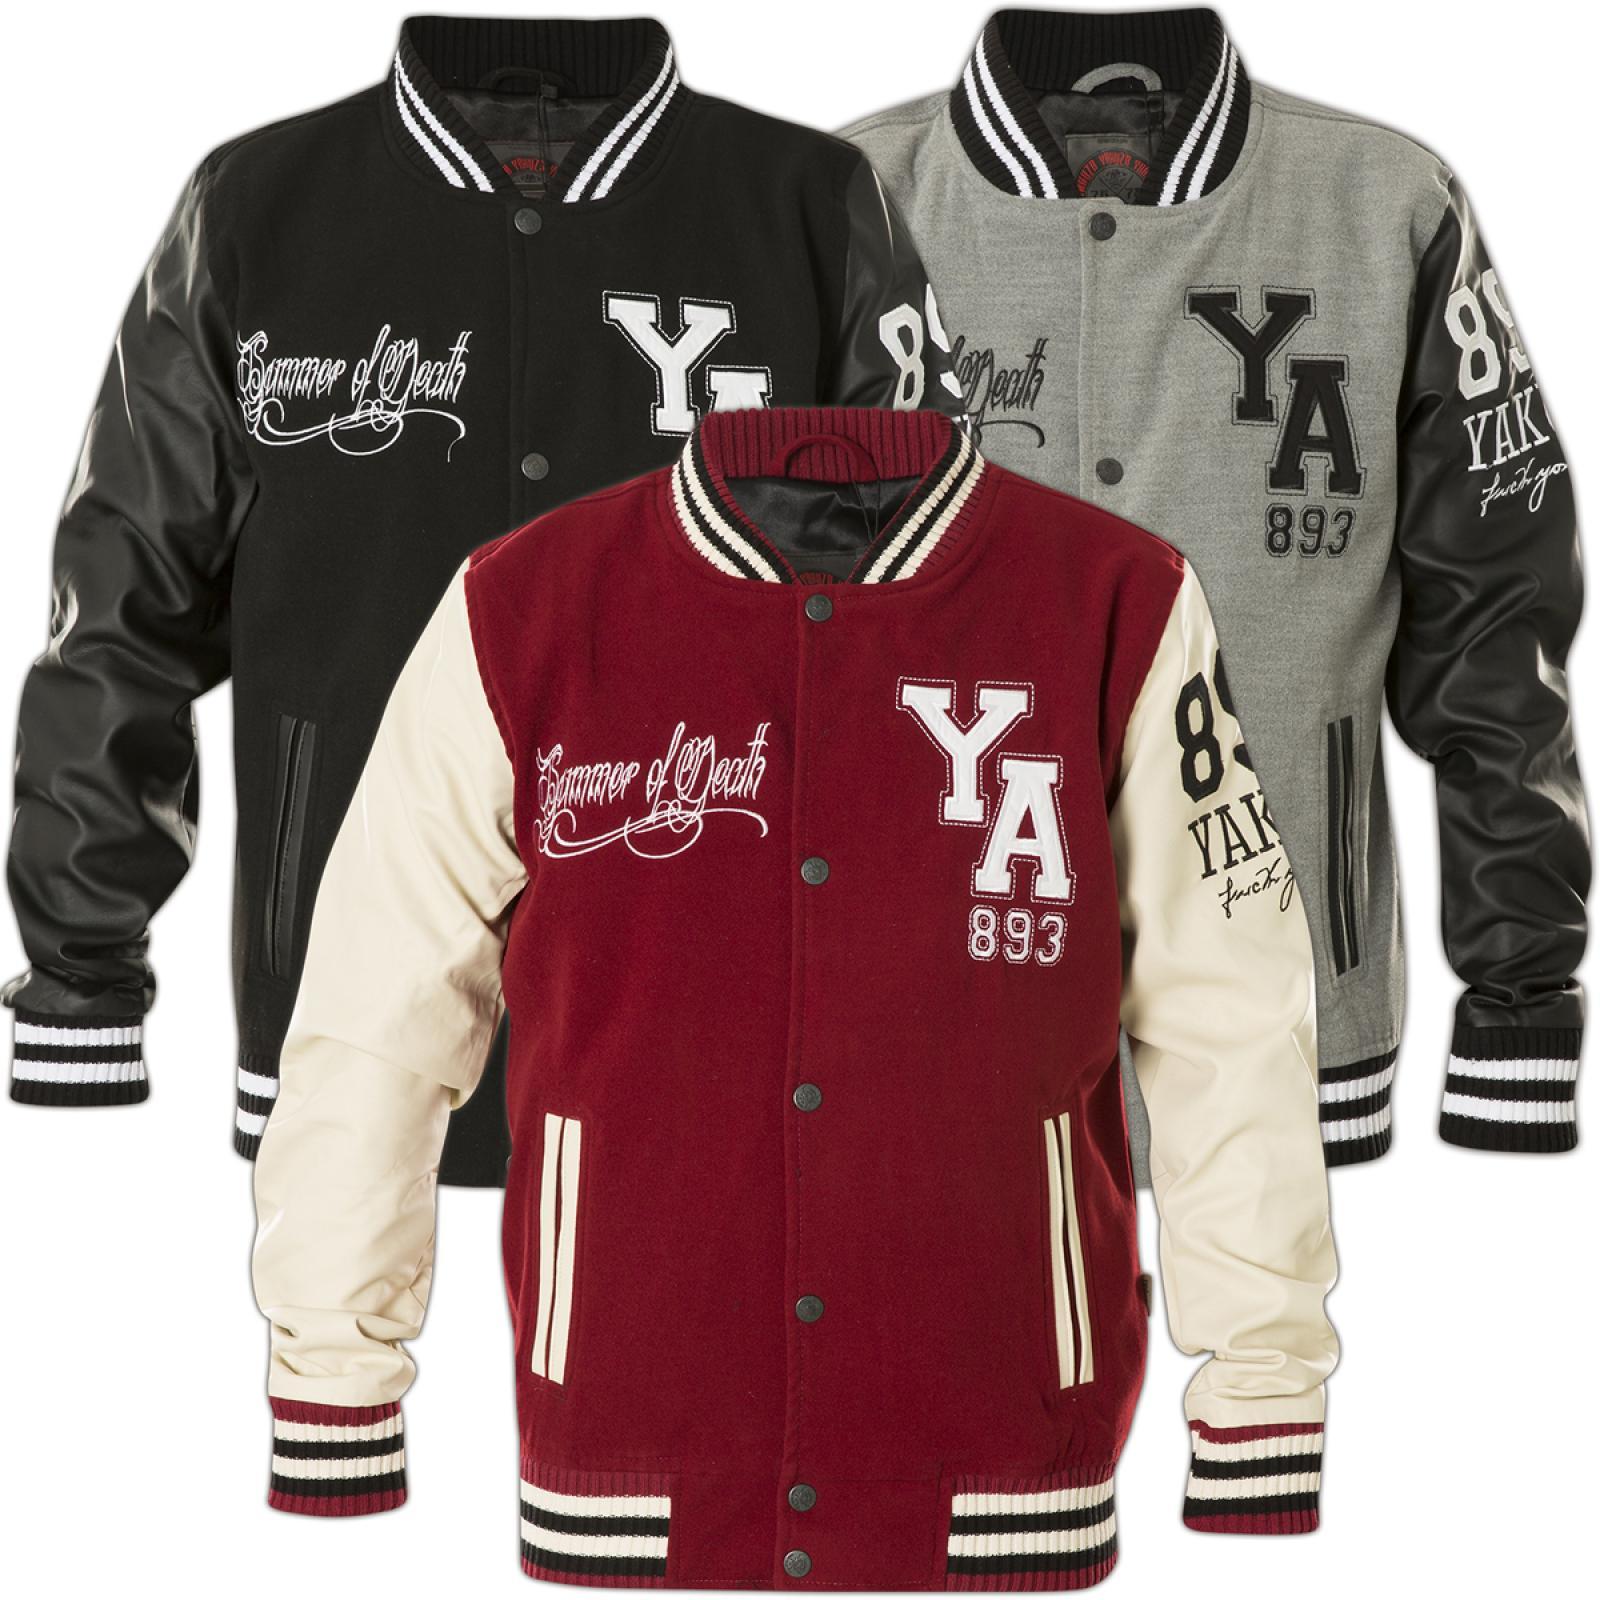 brand new 76538 74cc0 Yakuza Jacket Collegejacke Summer Of Death JB-9042 Black